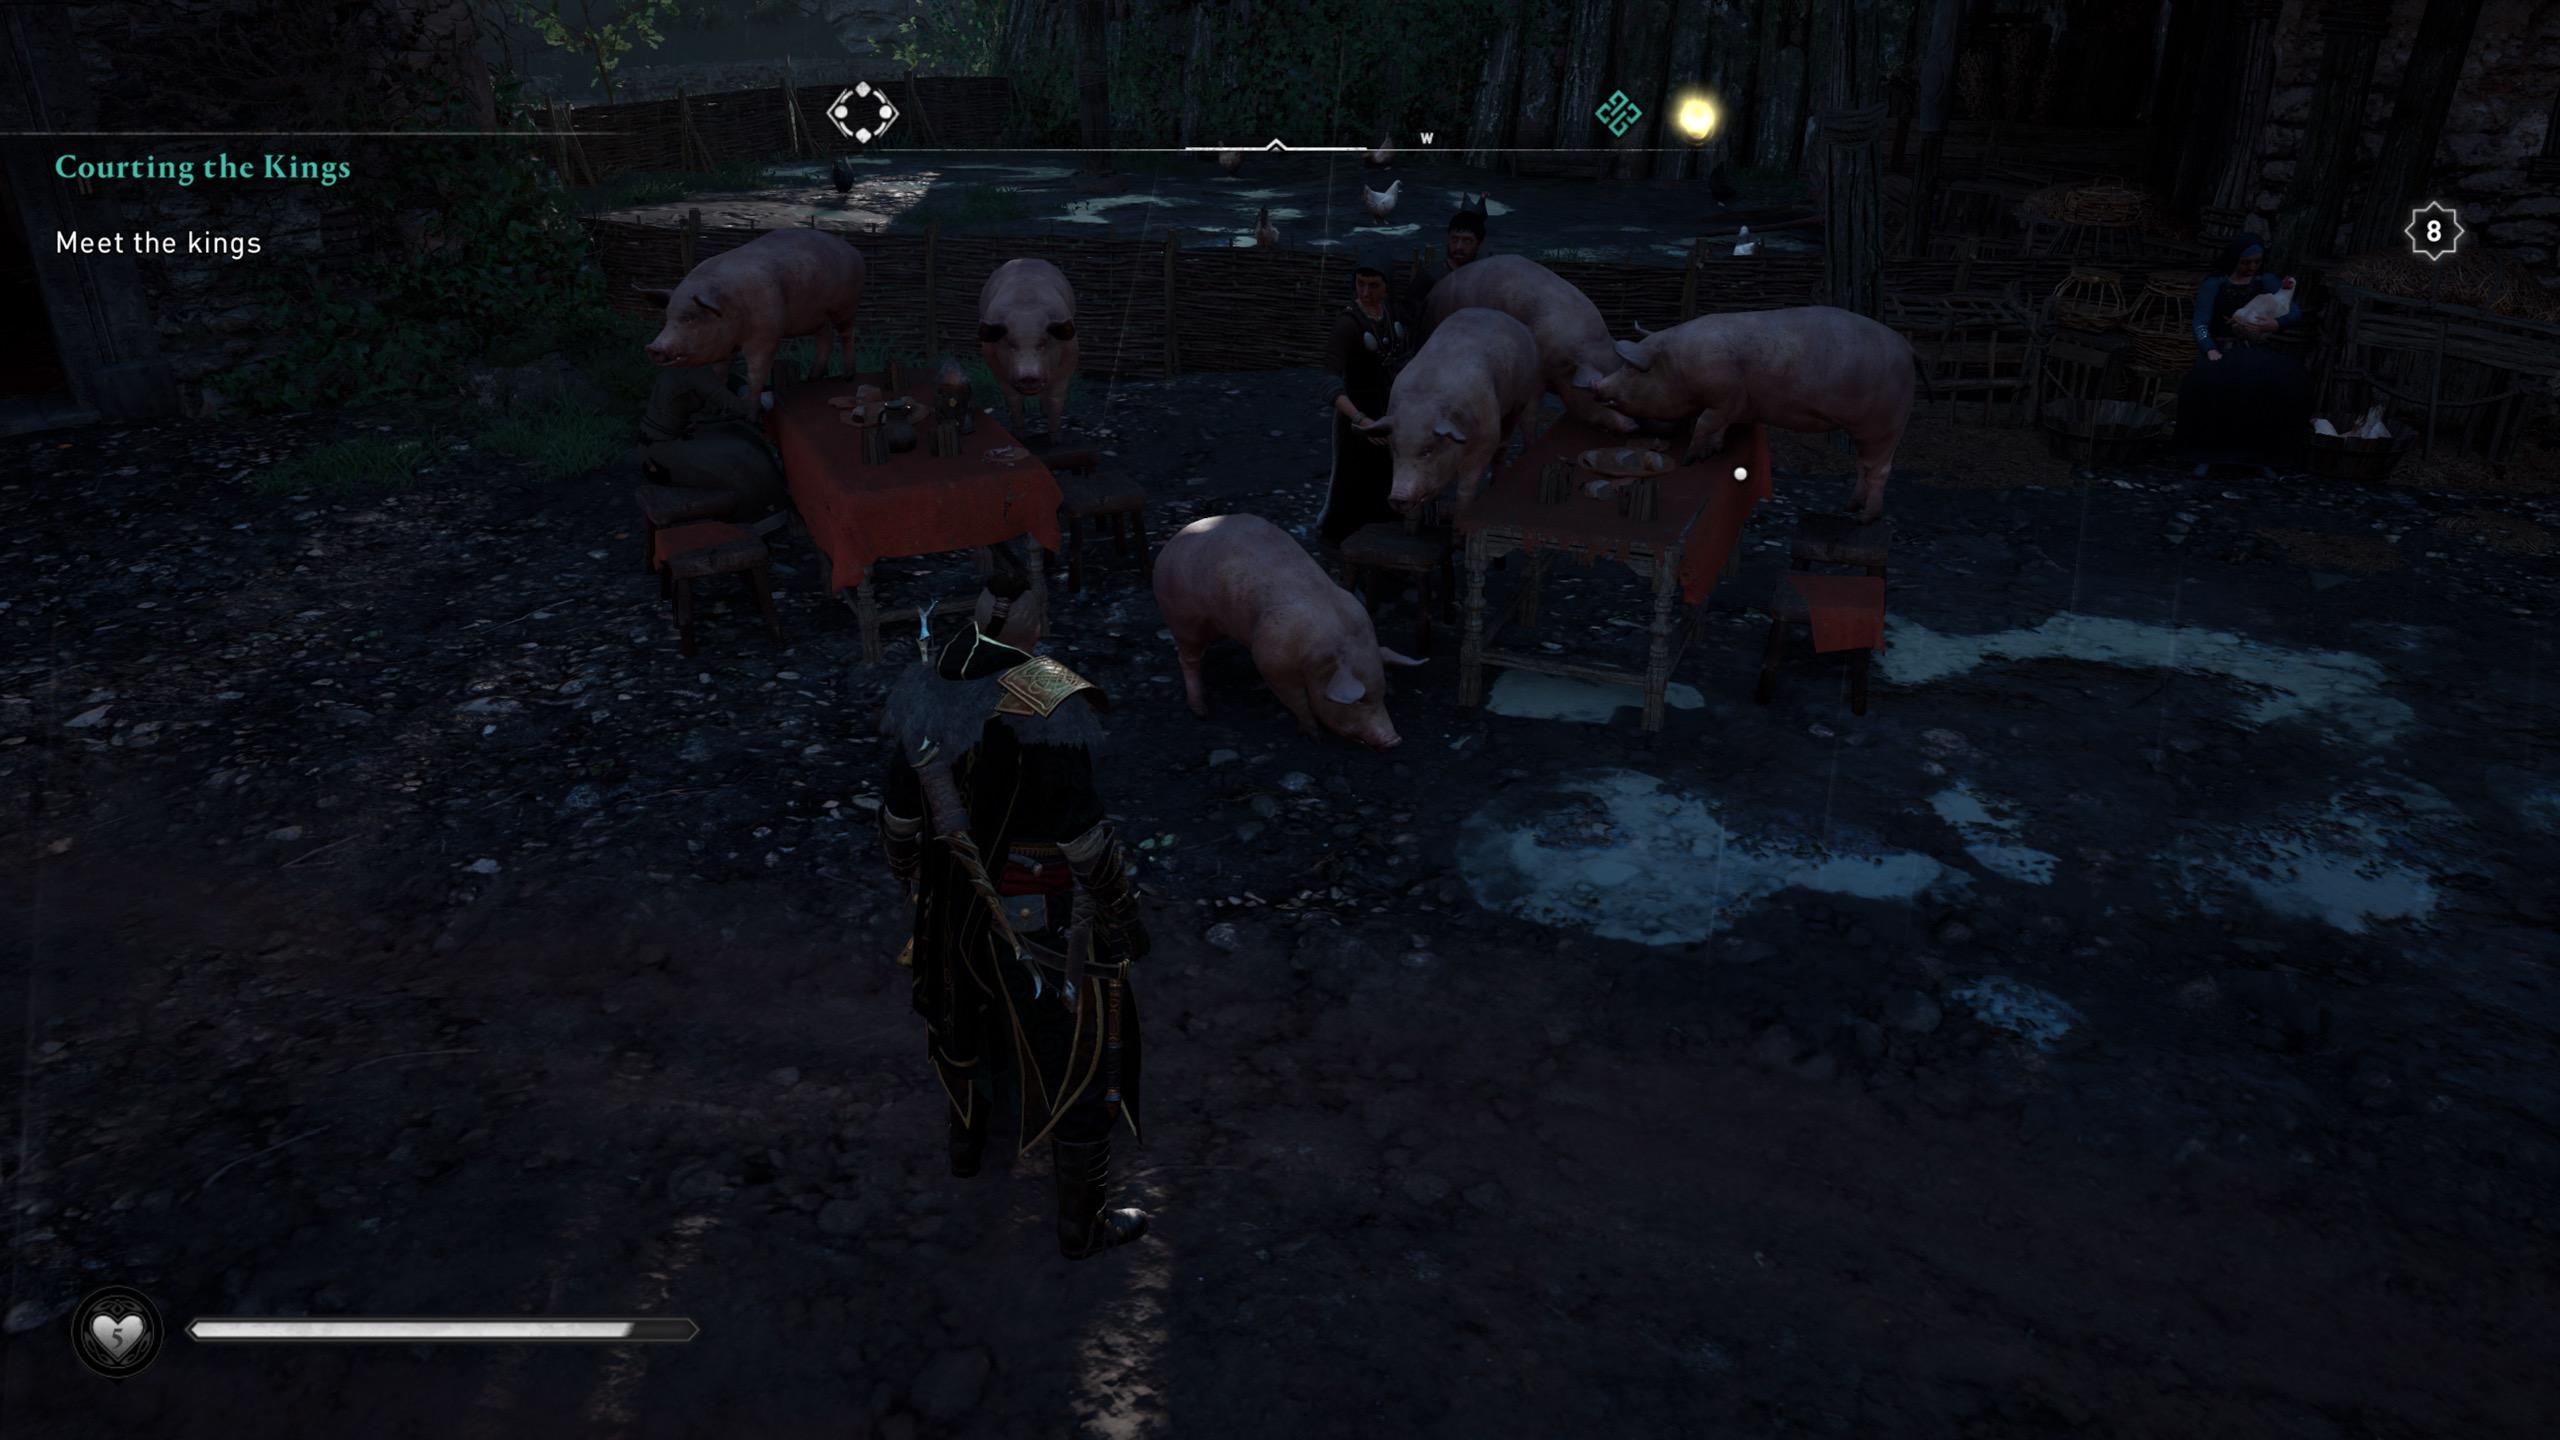 Assassin's Creed Valhalla Pig Instead of NPC Bug